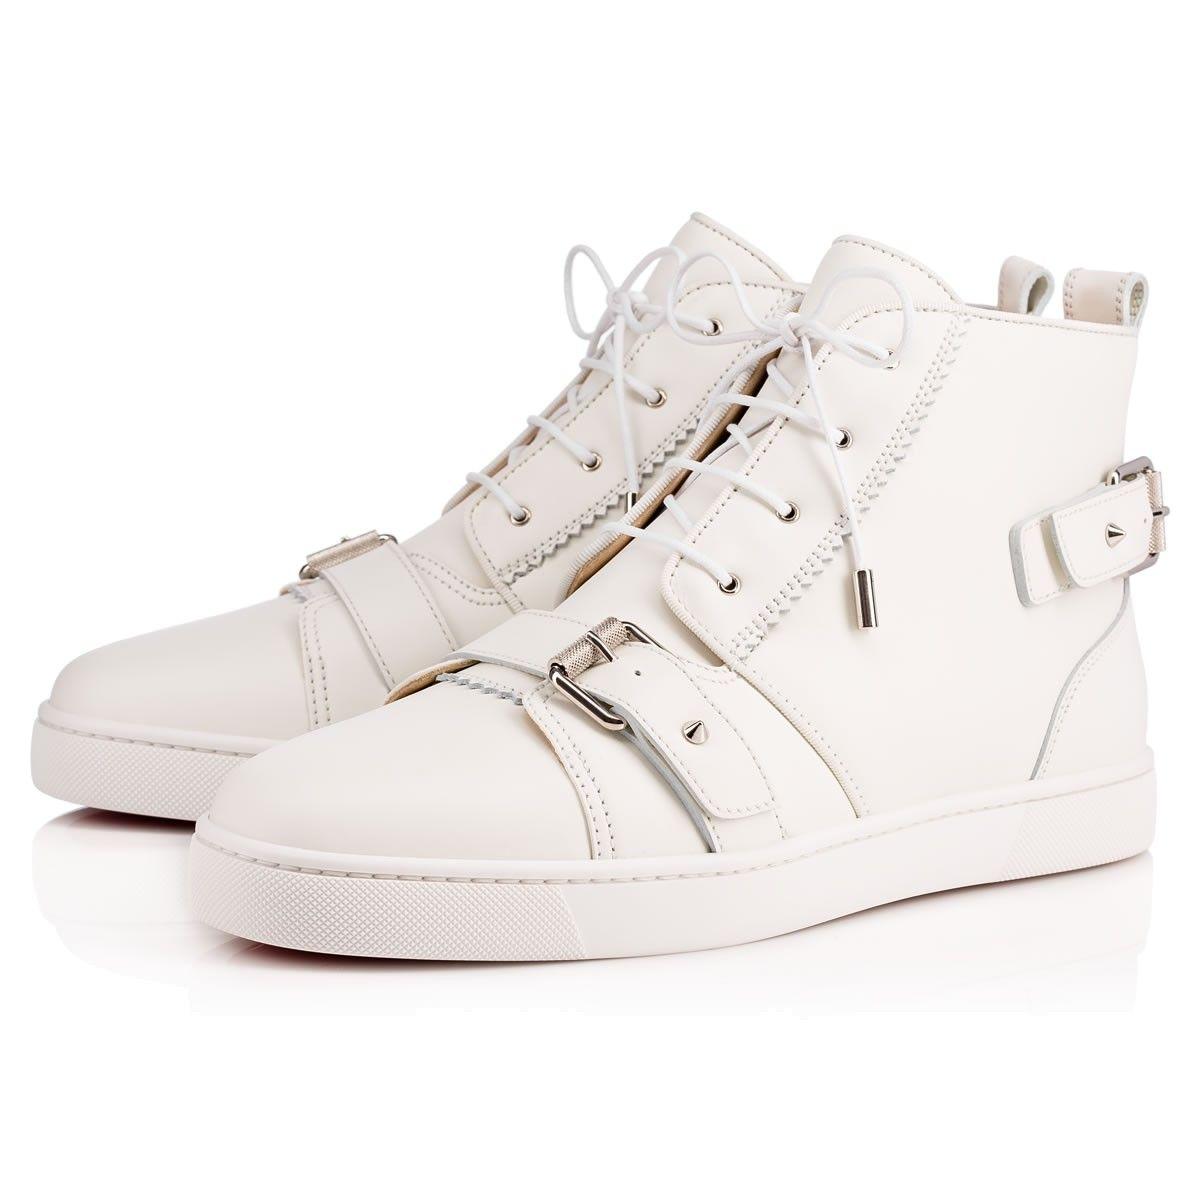 e18314b14966 Shoes - Nono Strap Flat - Christian Louboutin